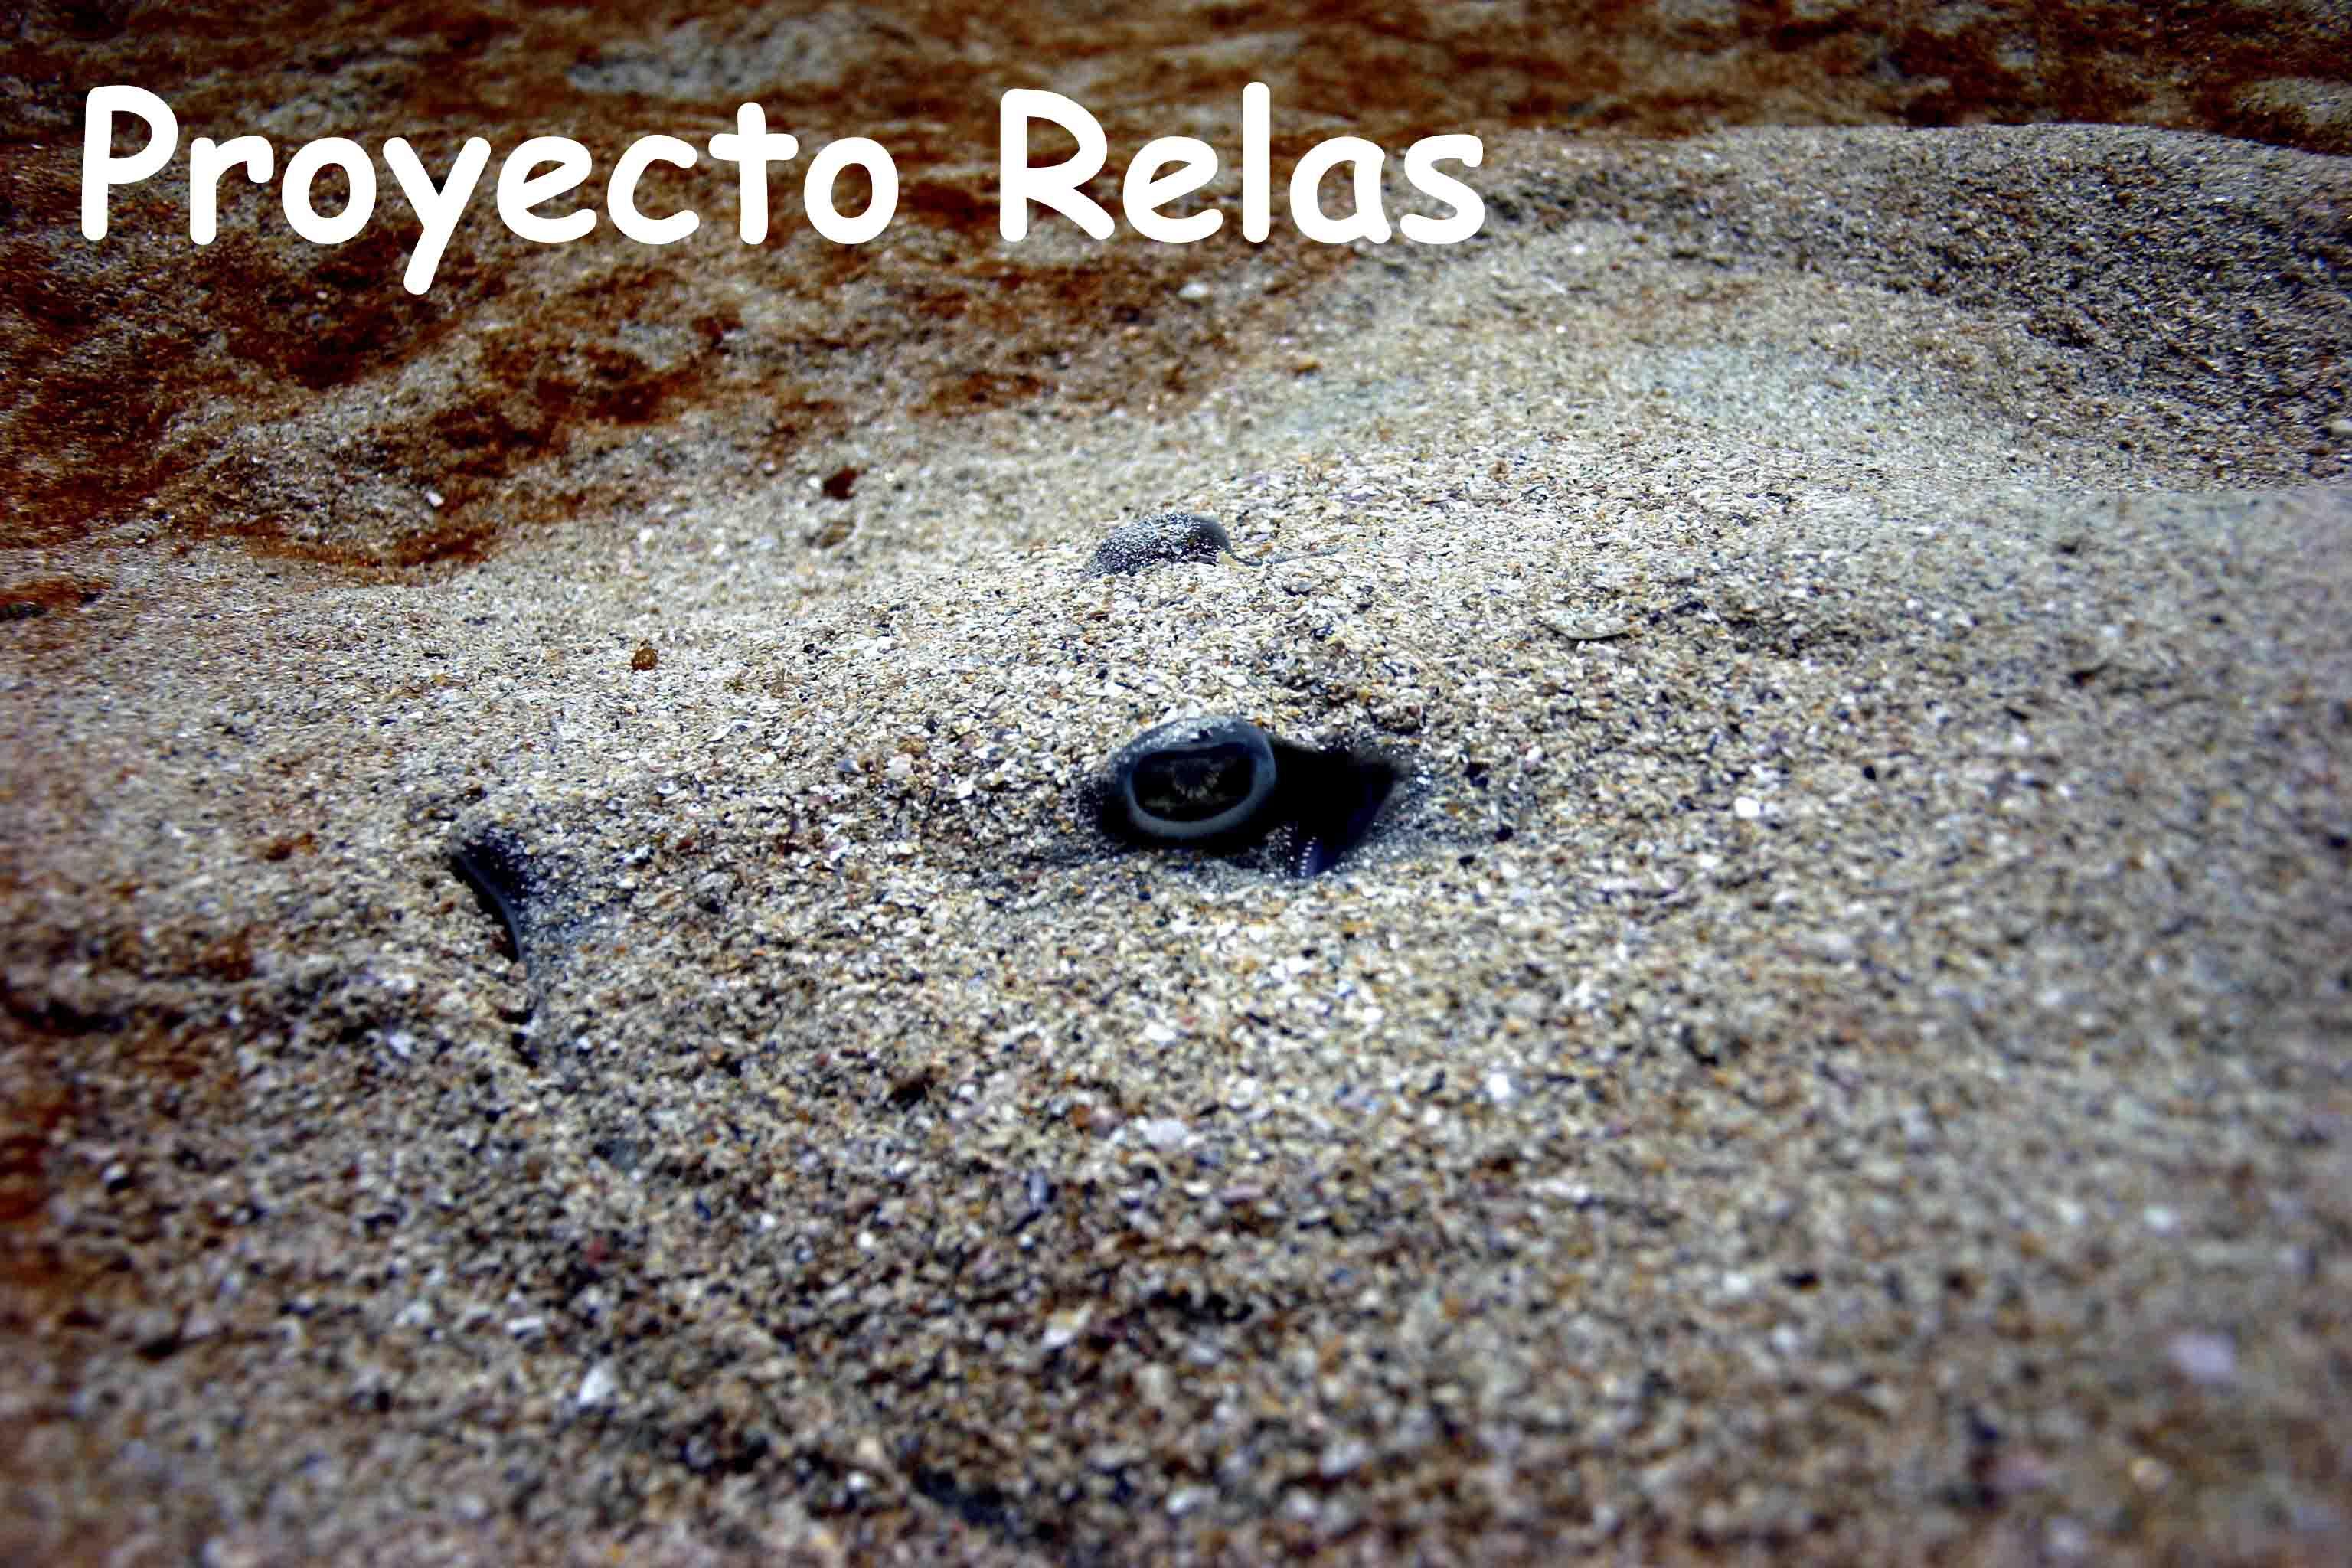 Proyecto RELAS